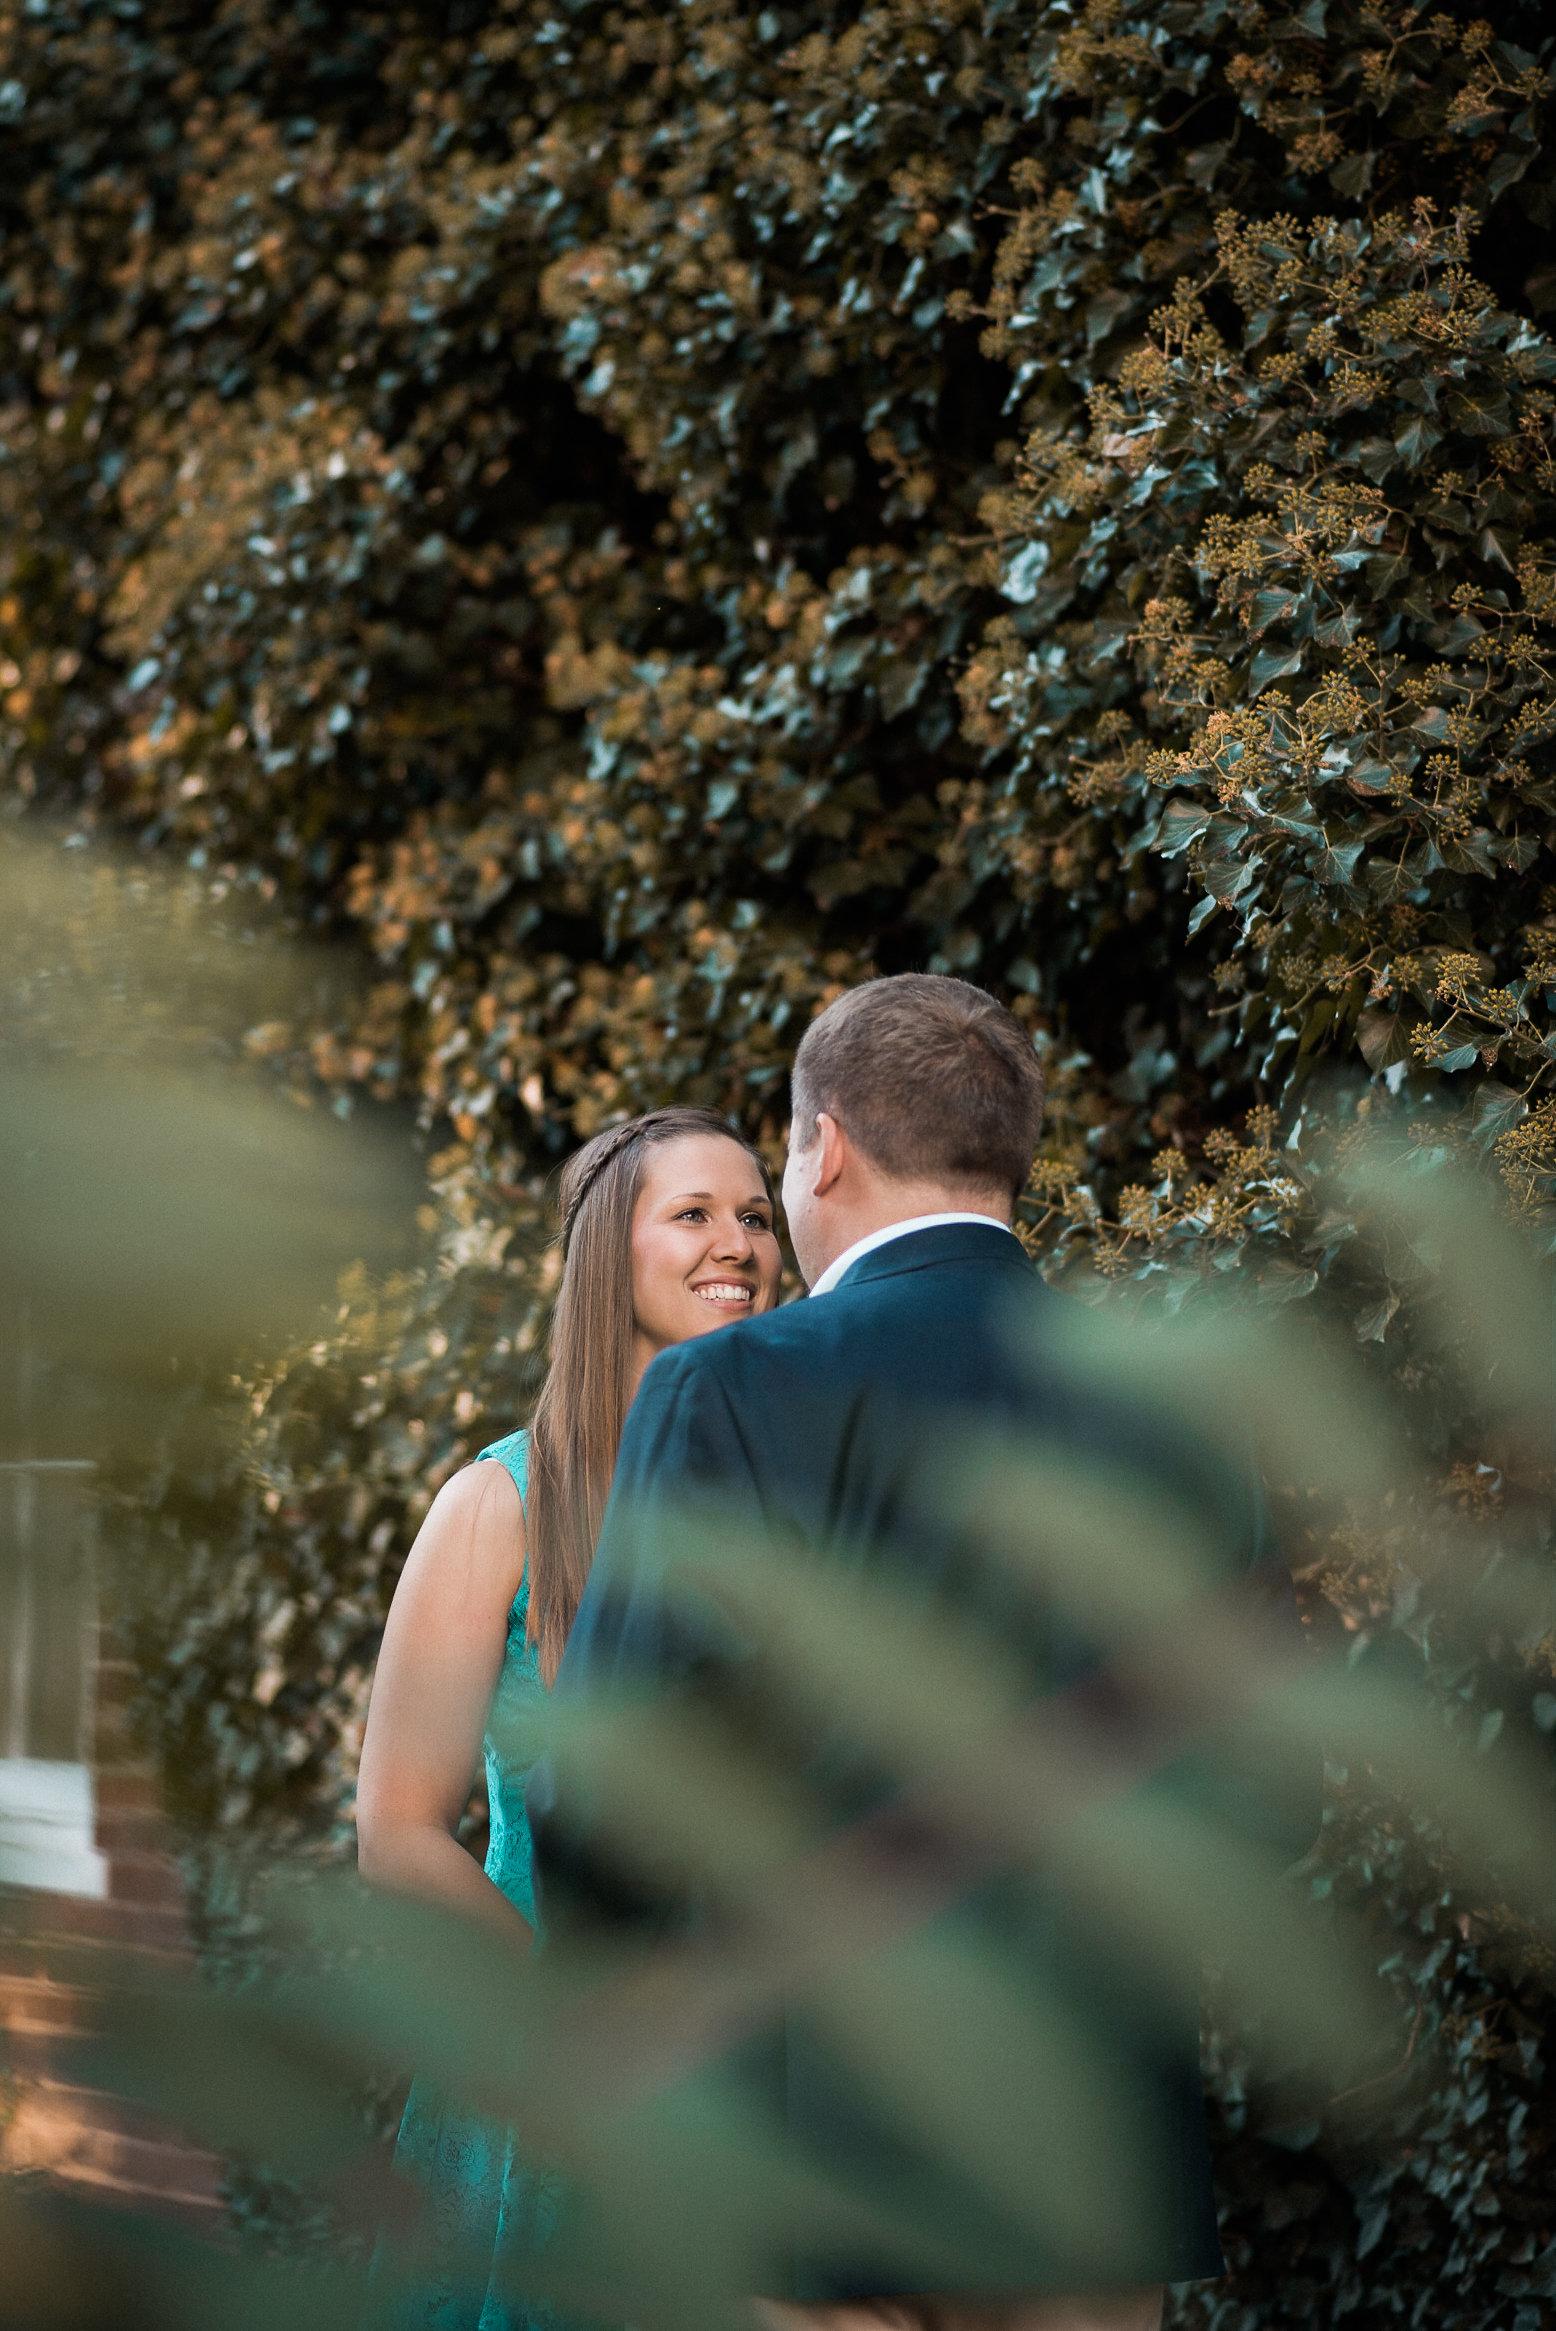 Couple seen behind fern